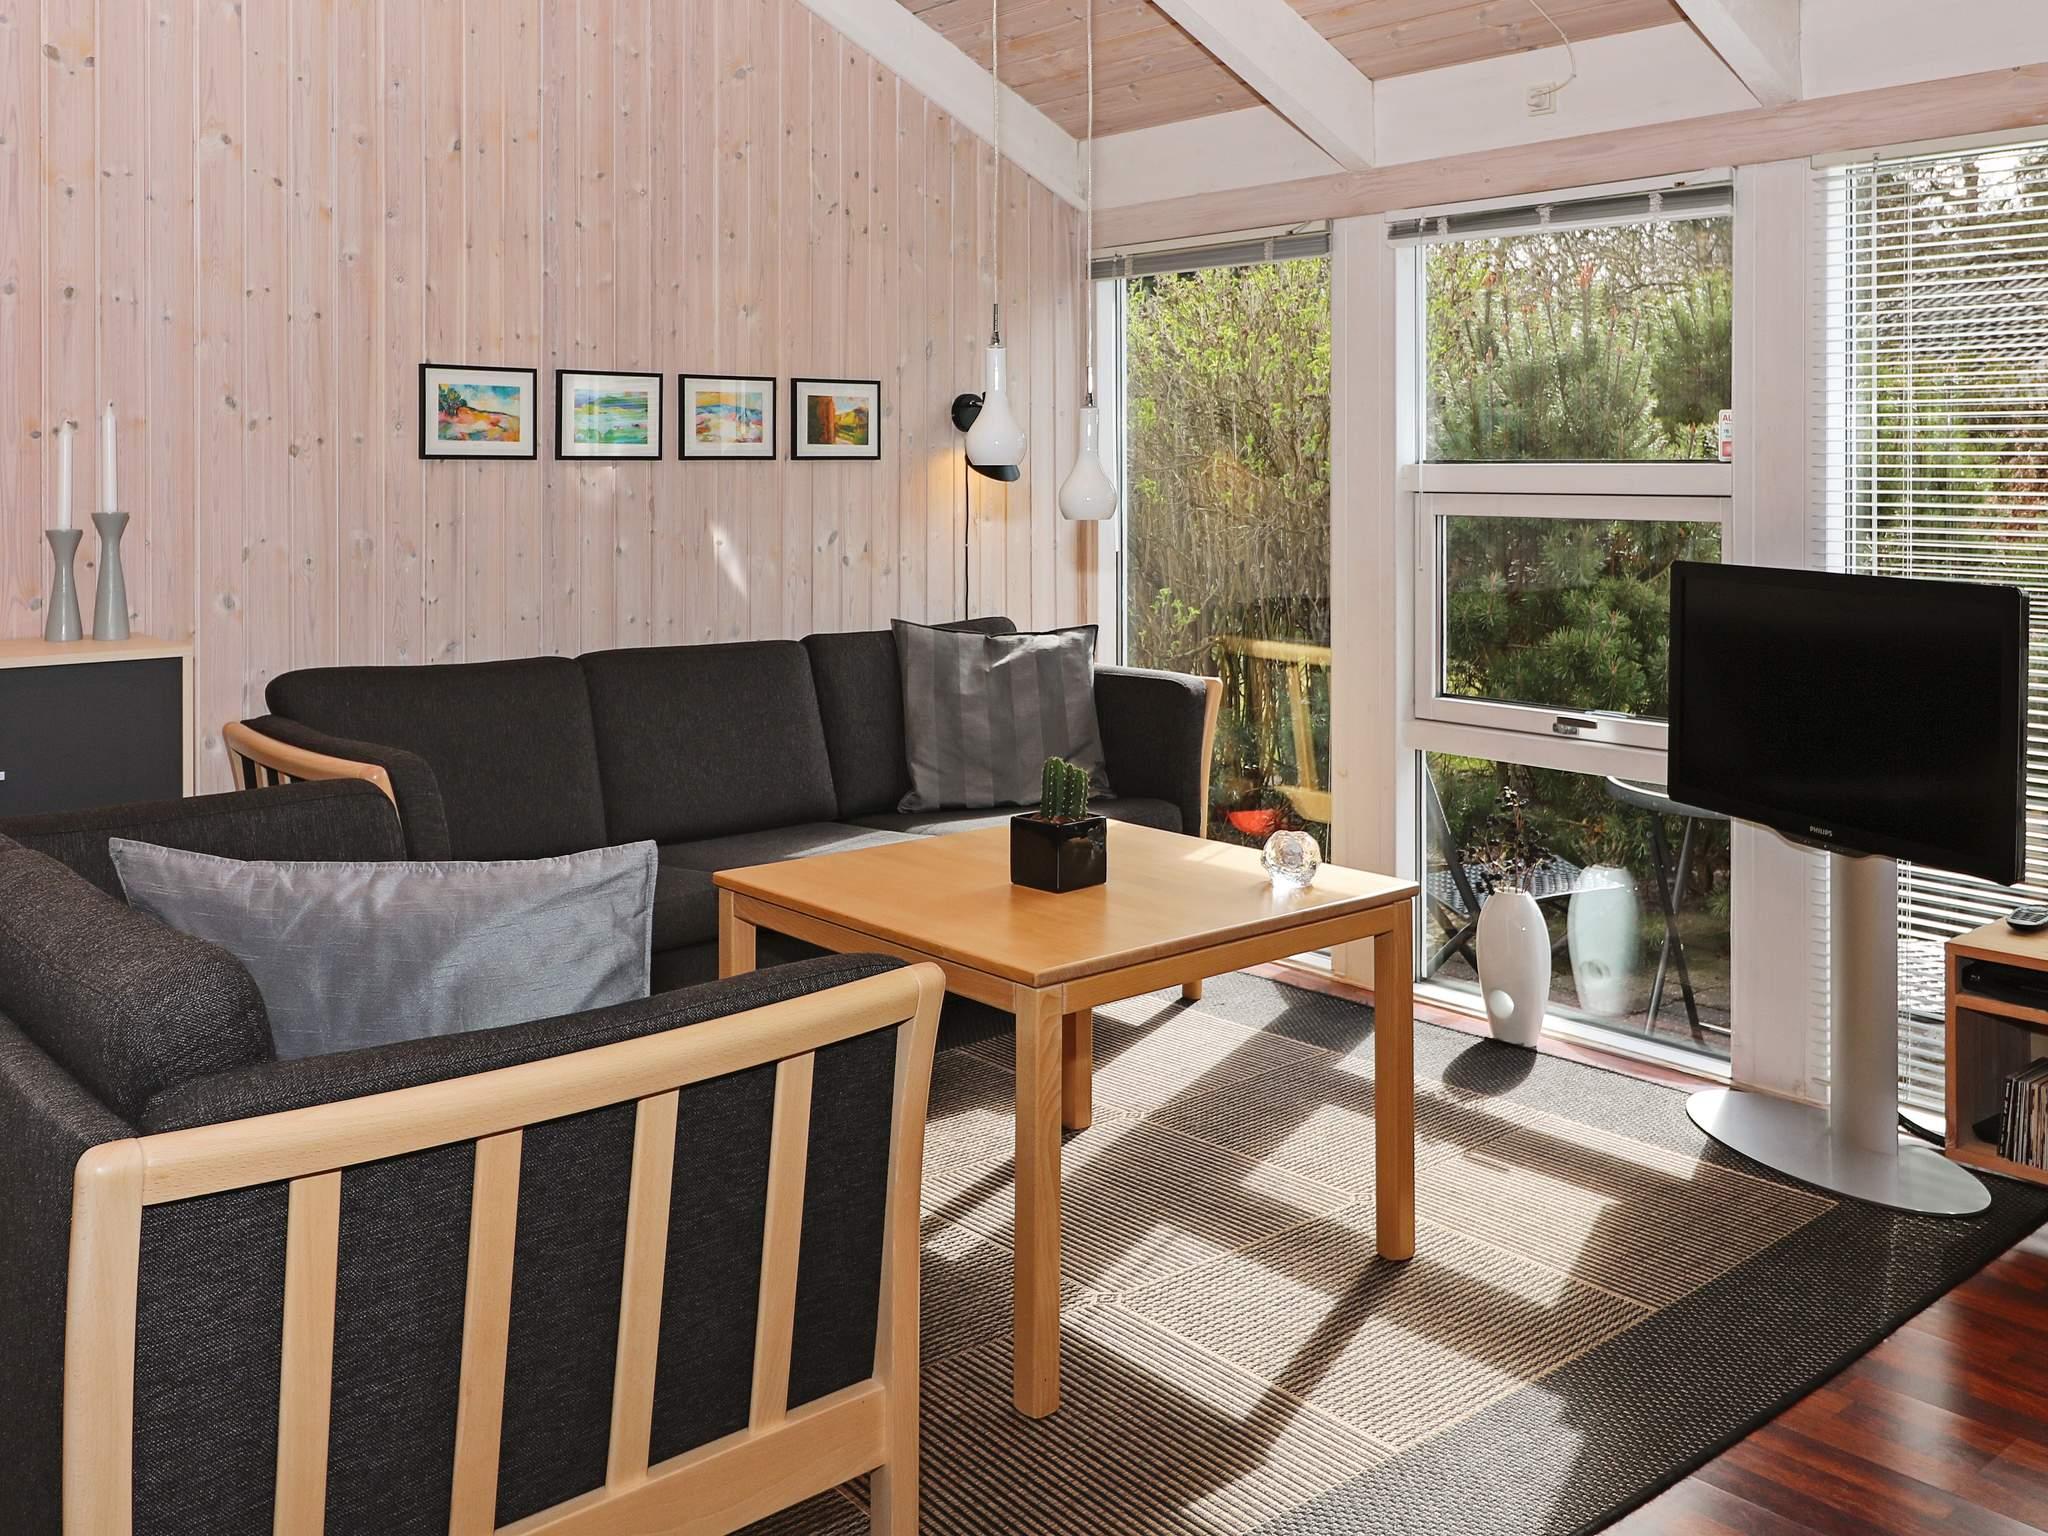 Ferienhaus Øster Hurup (83254), Øster Hurup, , Dänische Ostsee, Dänemark, Bild 3